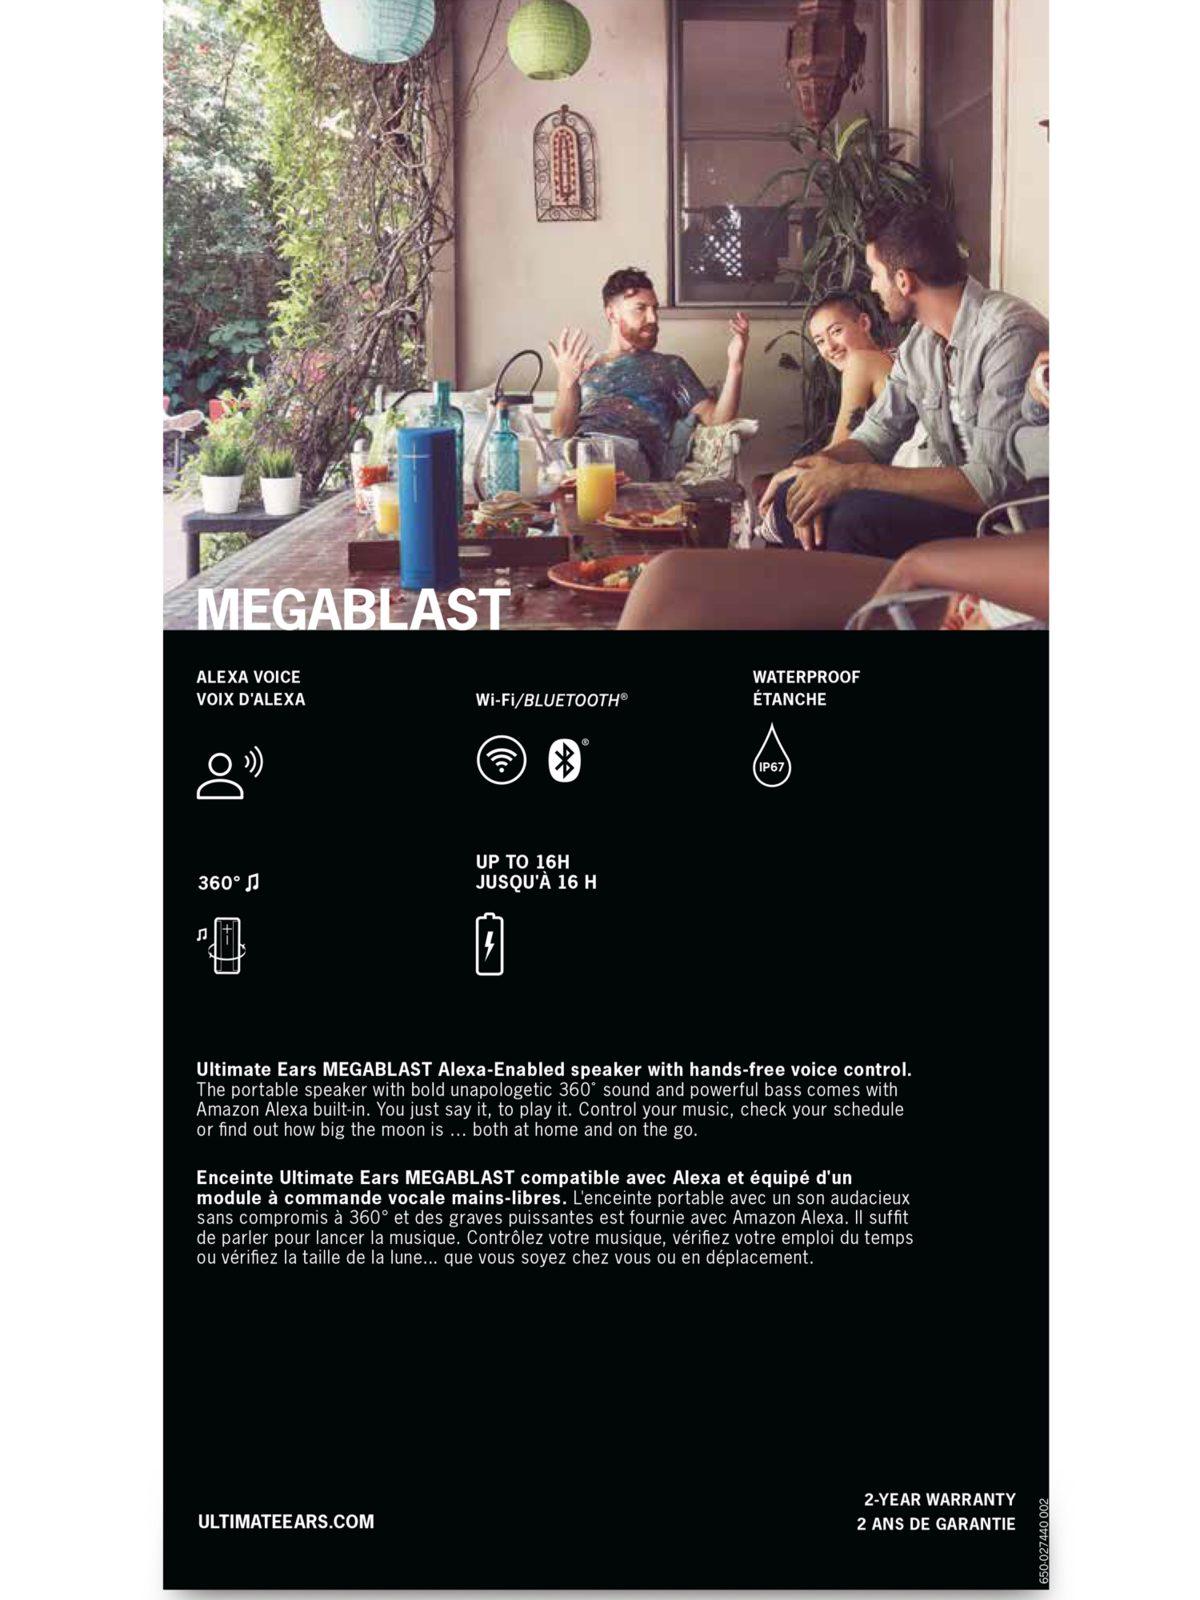 Ultimate Ears MEGABLAST Portable Wireless Speaker with Amazon Alexa